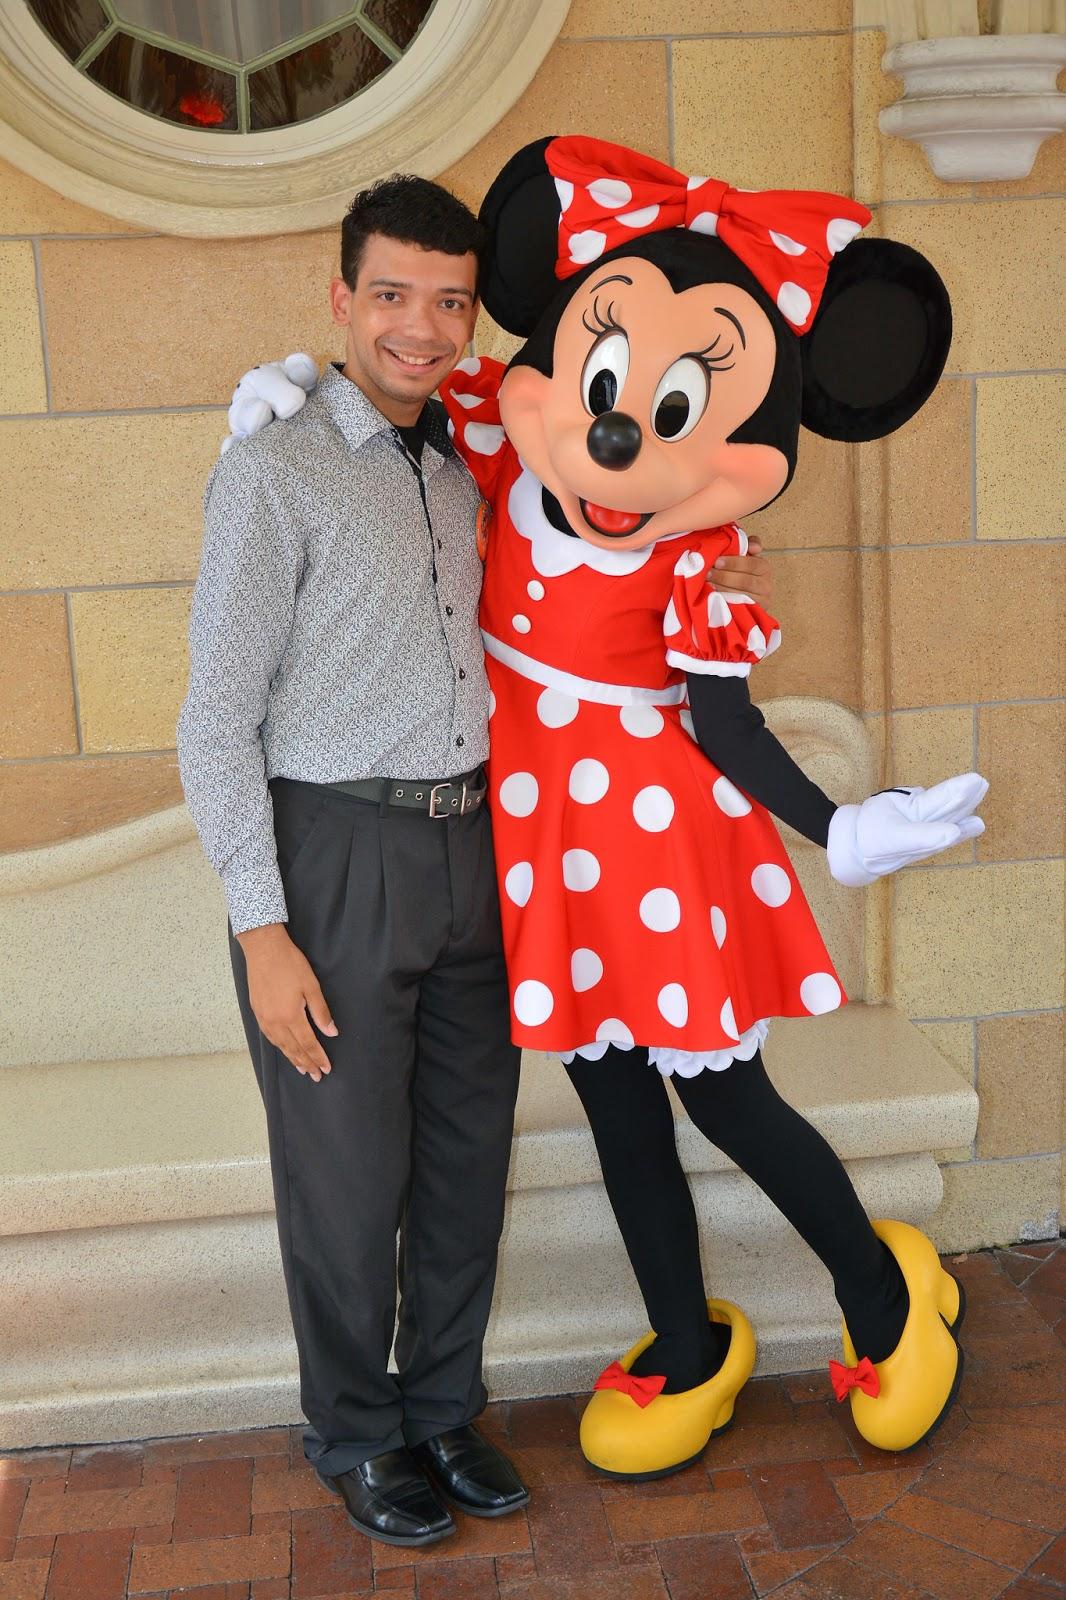 New Minnie u0026 I at Disneyland 2017  sc 1 st  Pupepepets Blog & Pupepepets Blog: Mickey u0026 Minnie Through the Years 1955- Present ...